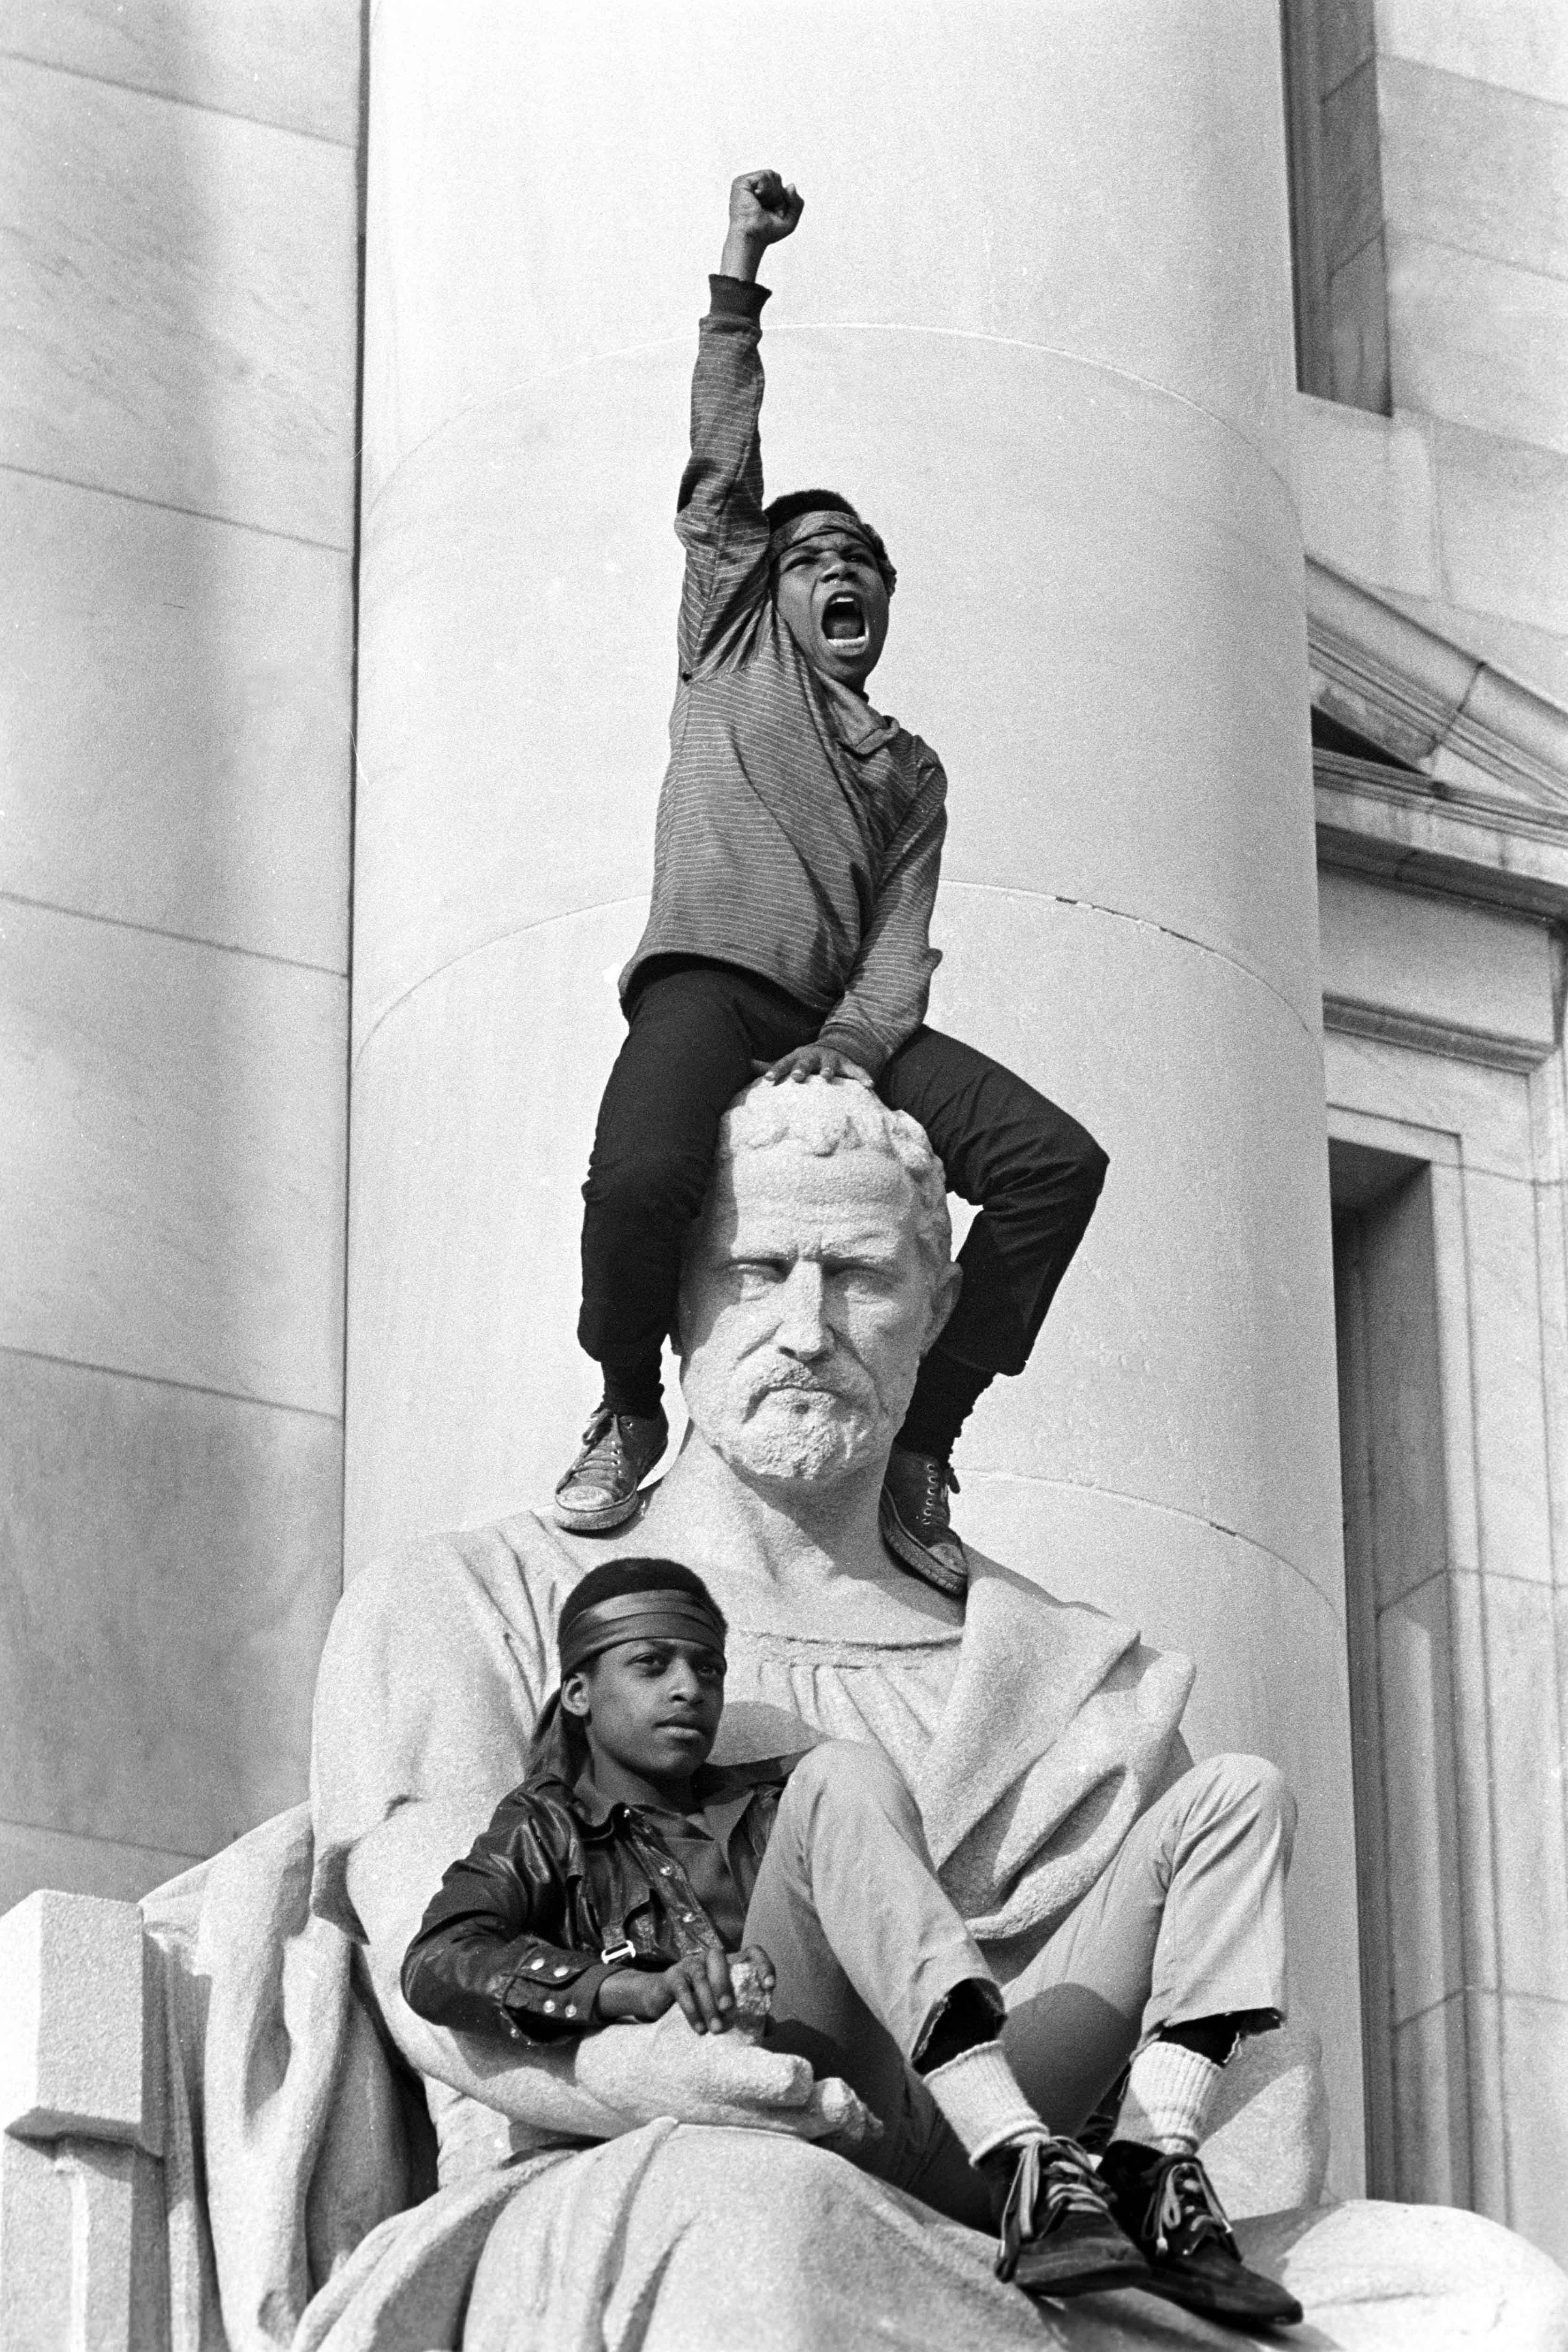 Manifestation pendant le procès de Bobby Seale et Ericka Huggins, New Haven,1er mai 1970  © Stephen Shames / courtesy Steven Kasher Gallery